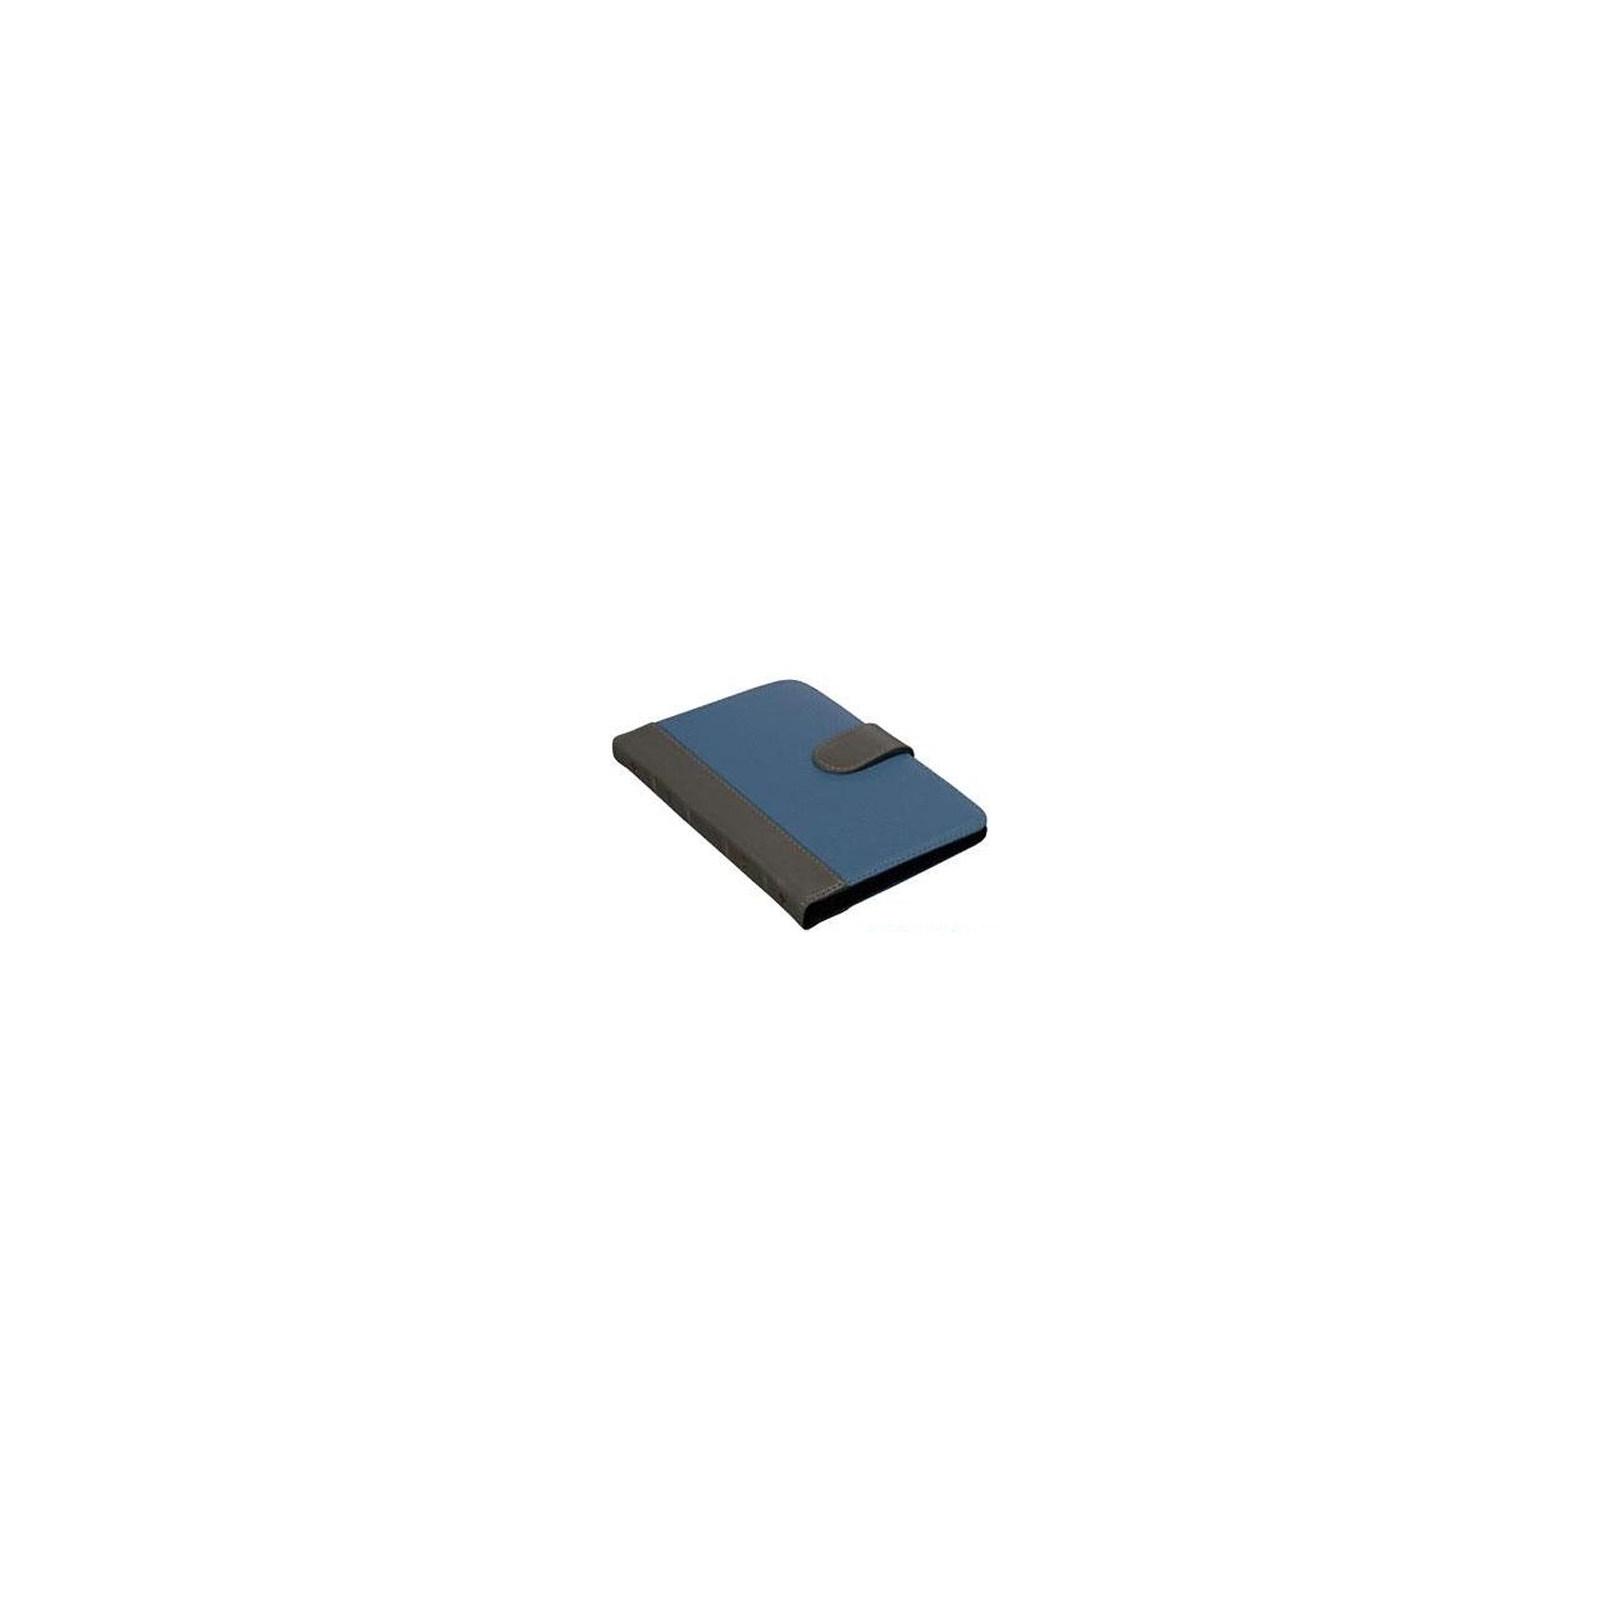 Чехол для электронной книги SB Bookcase L Blue/Grey (SB141089)